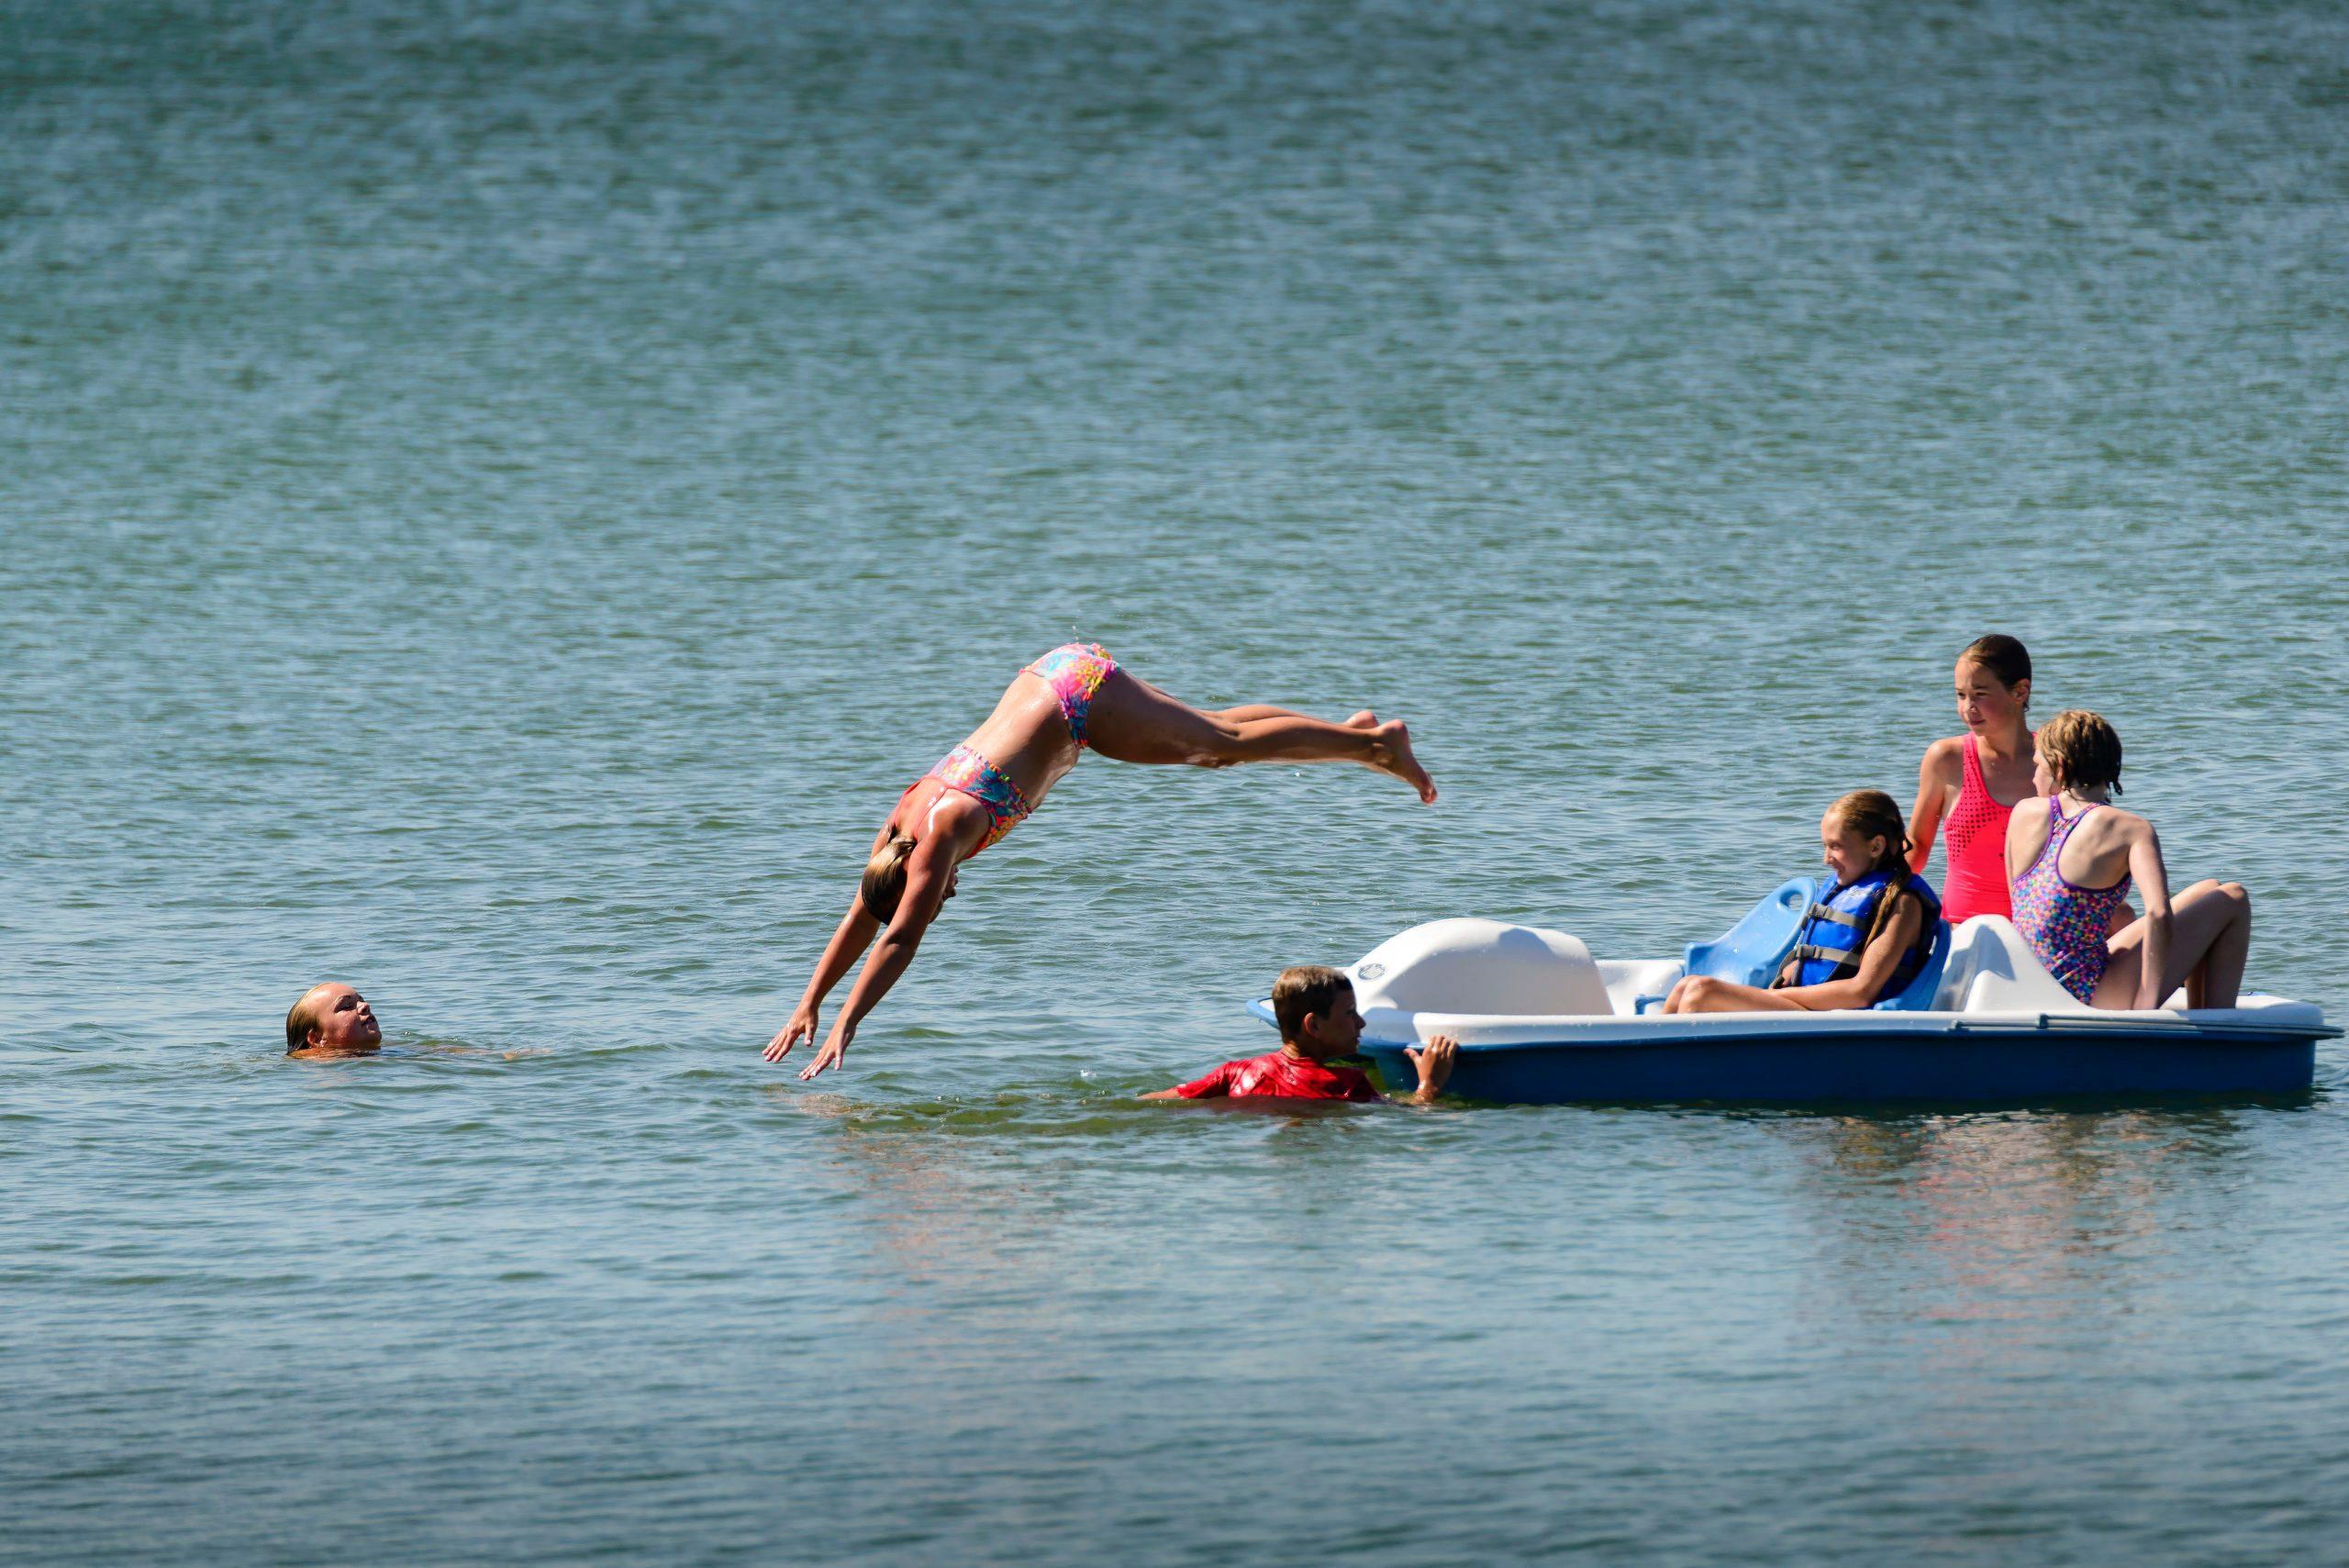 South Dakota: Lake Poinsett